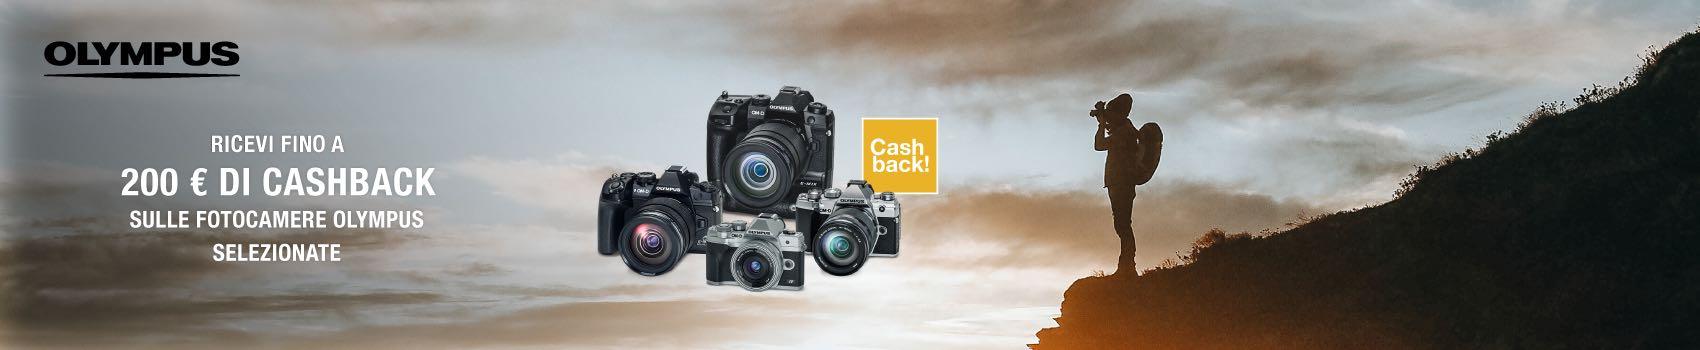 Olympus: nuovo Cashback OM-D